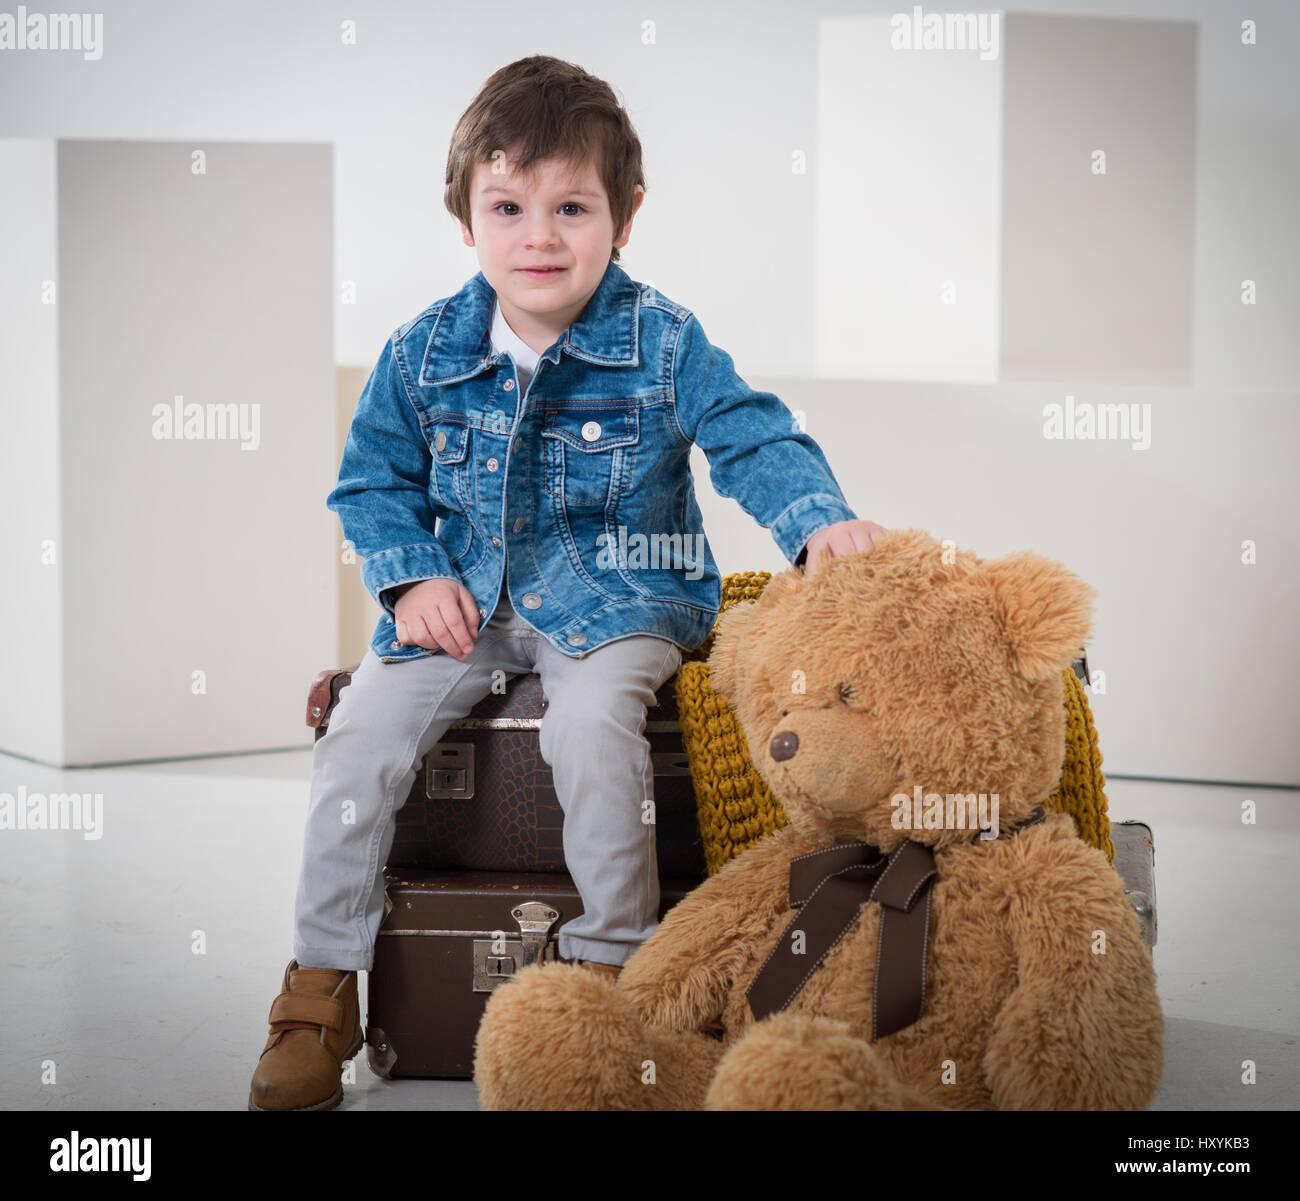 Teddy Bear Passport Bear Toy Soft Animal Travelling Gift Children Kids Holidays